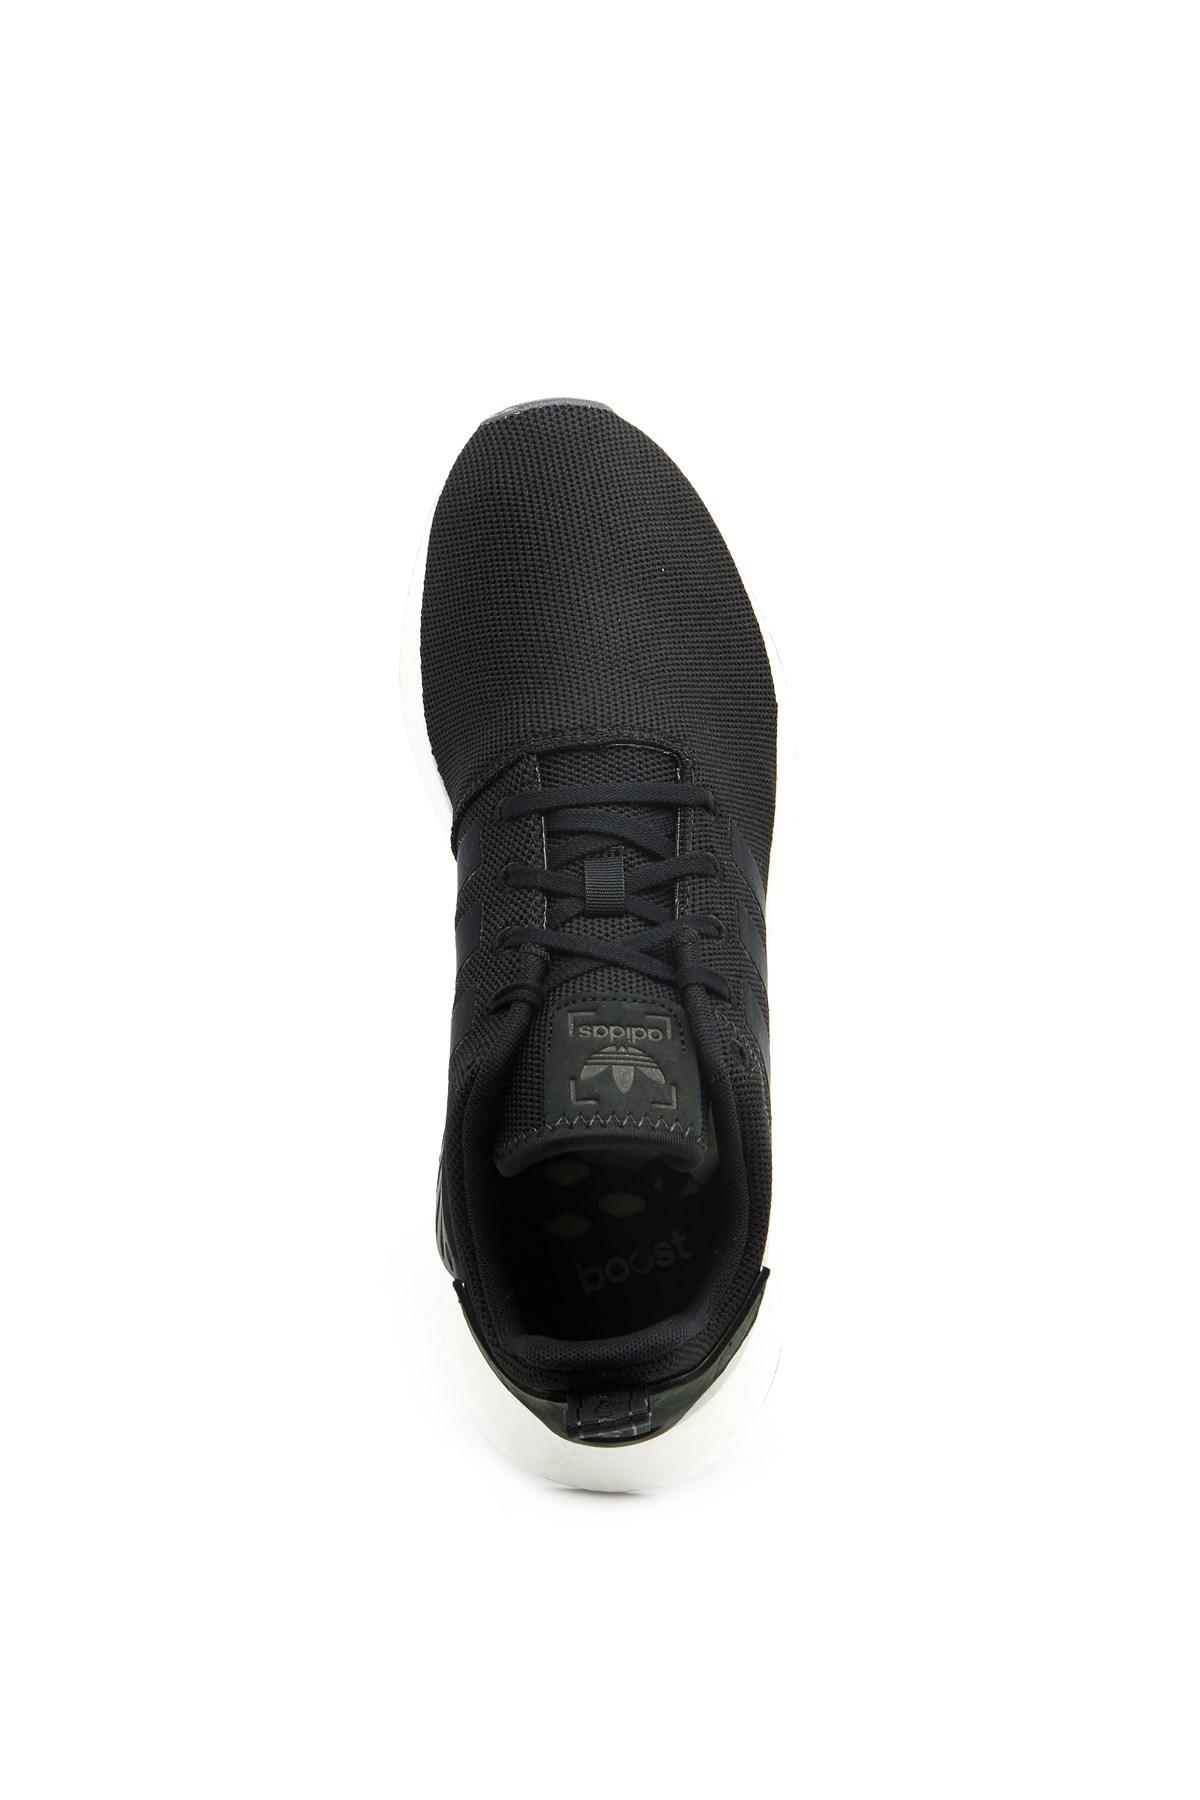 adidas originals 'nmd r2' sneakers